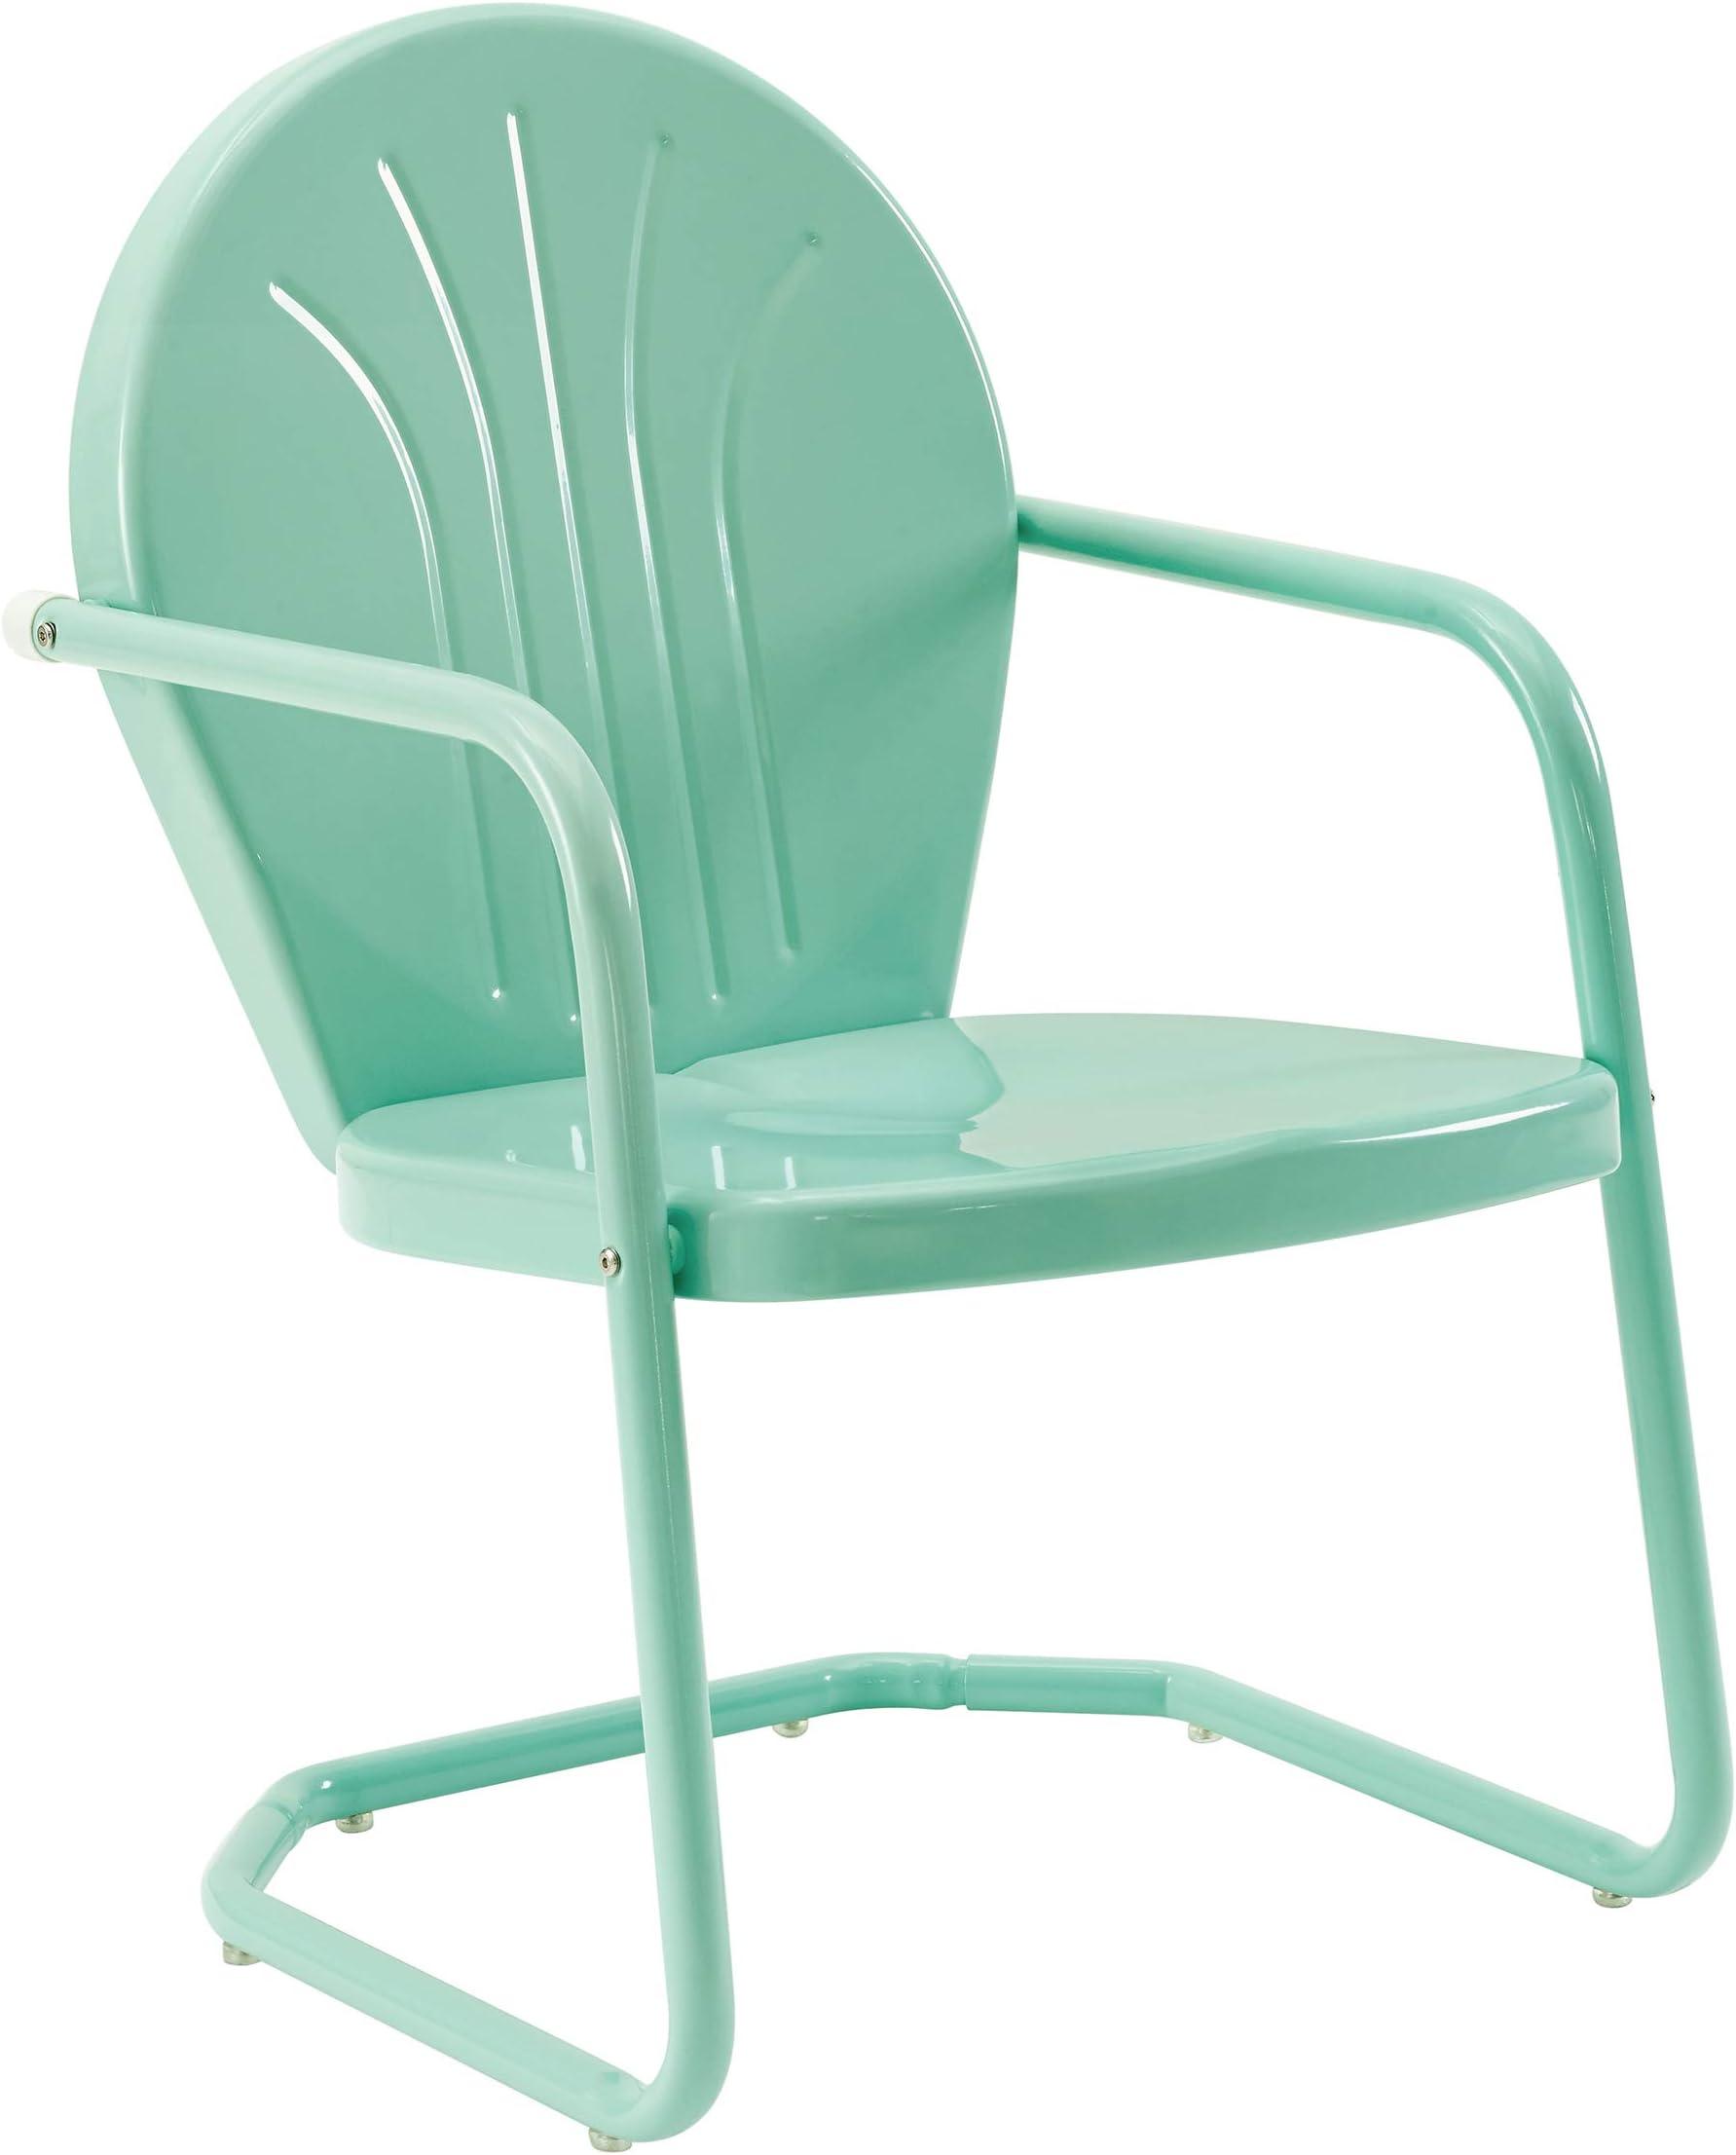 Crosley Furniture CO1001A-AQ Griffith Retro Metal Outdoor Chair, Aqua